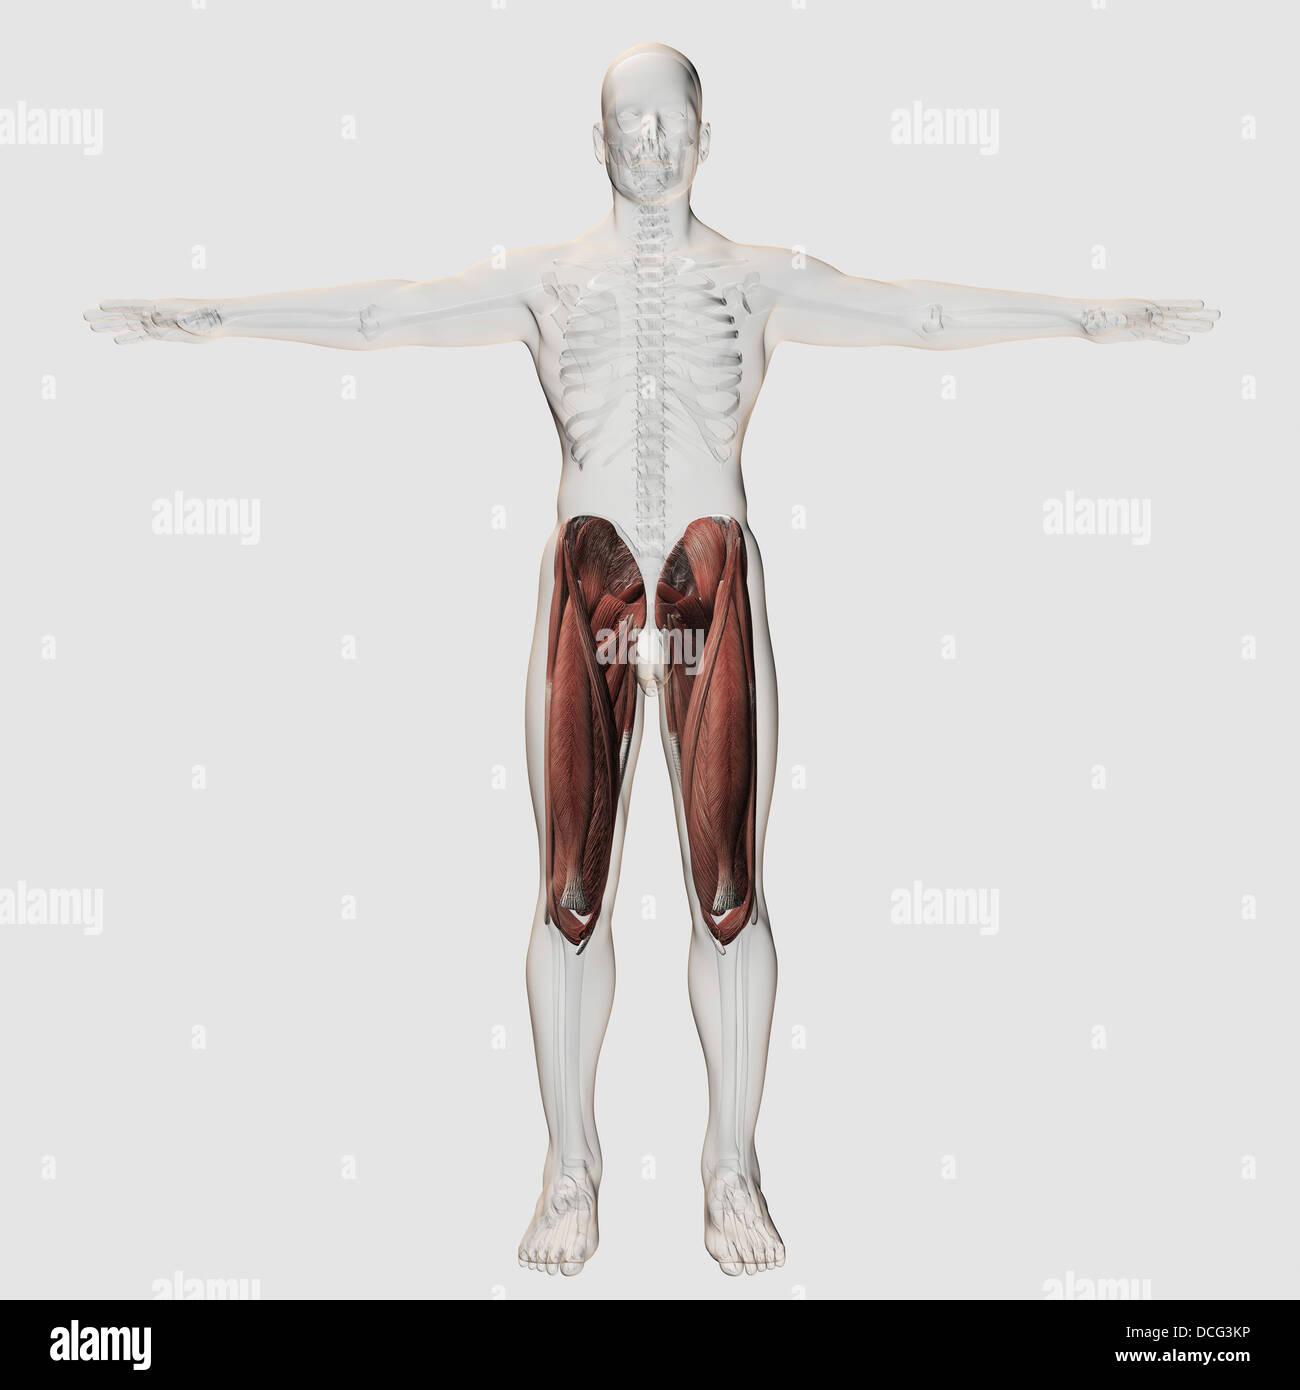 Rectus Femoris Muscle Stockfotos & Rectus Femoris Muscle Bilder - Alamy